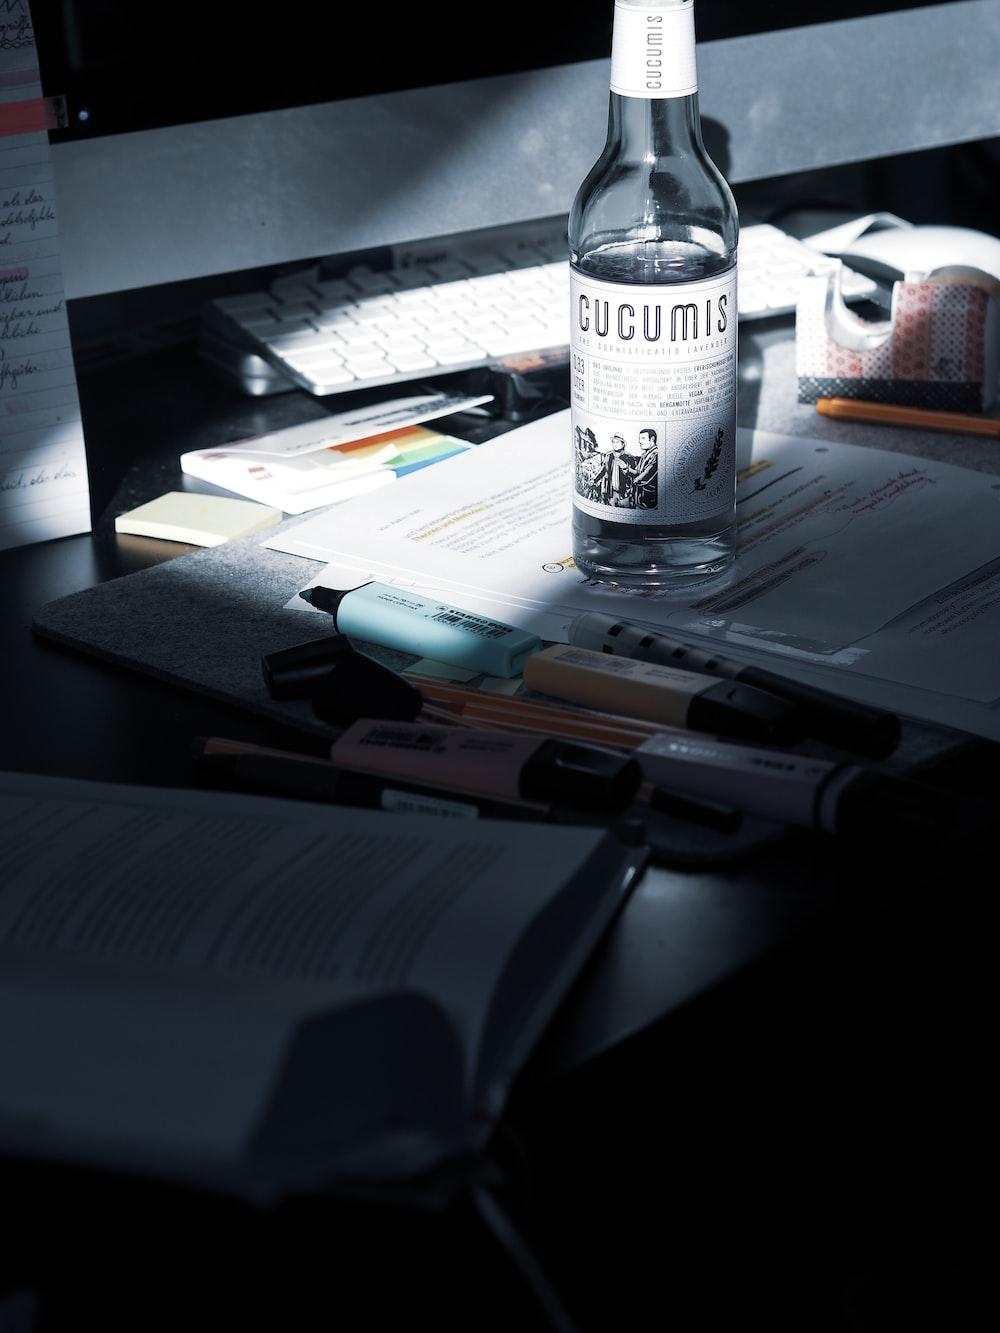 clear plastic bottle on white printer paper